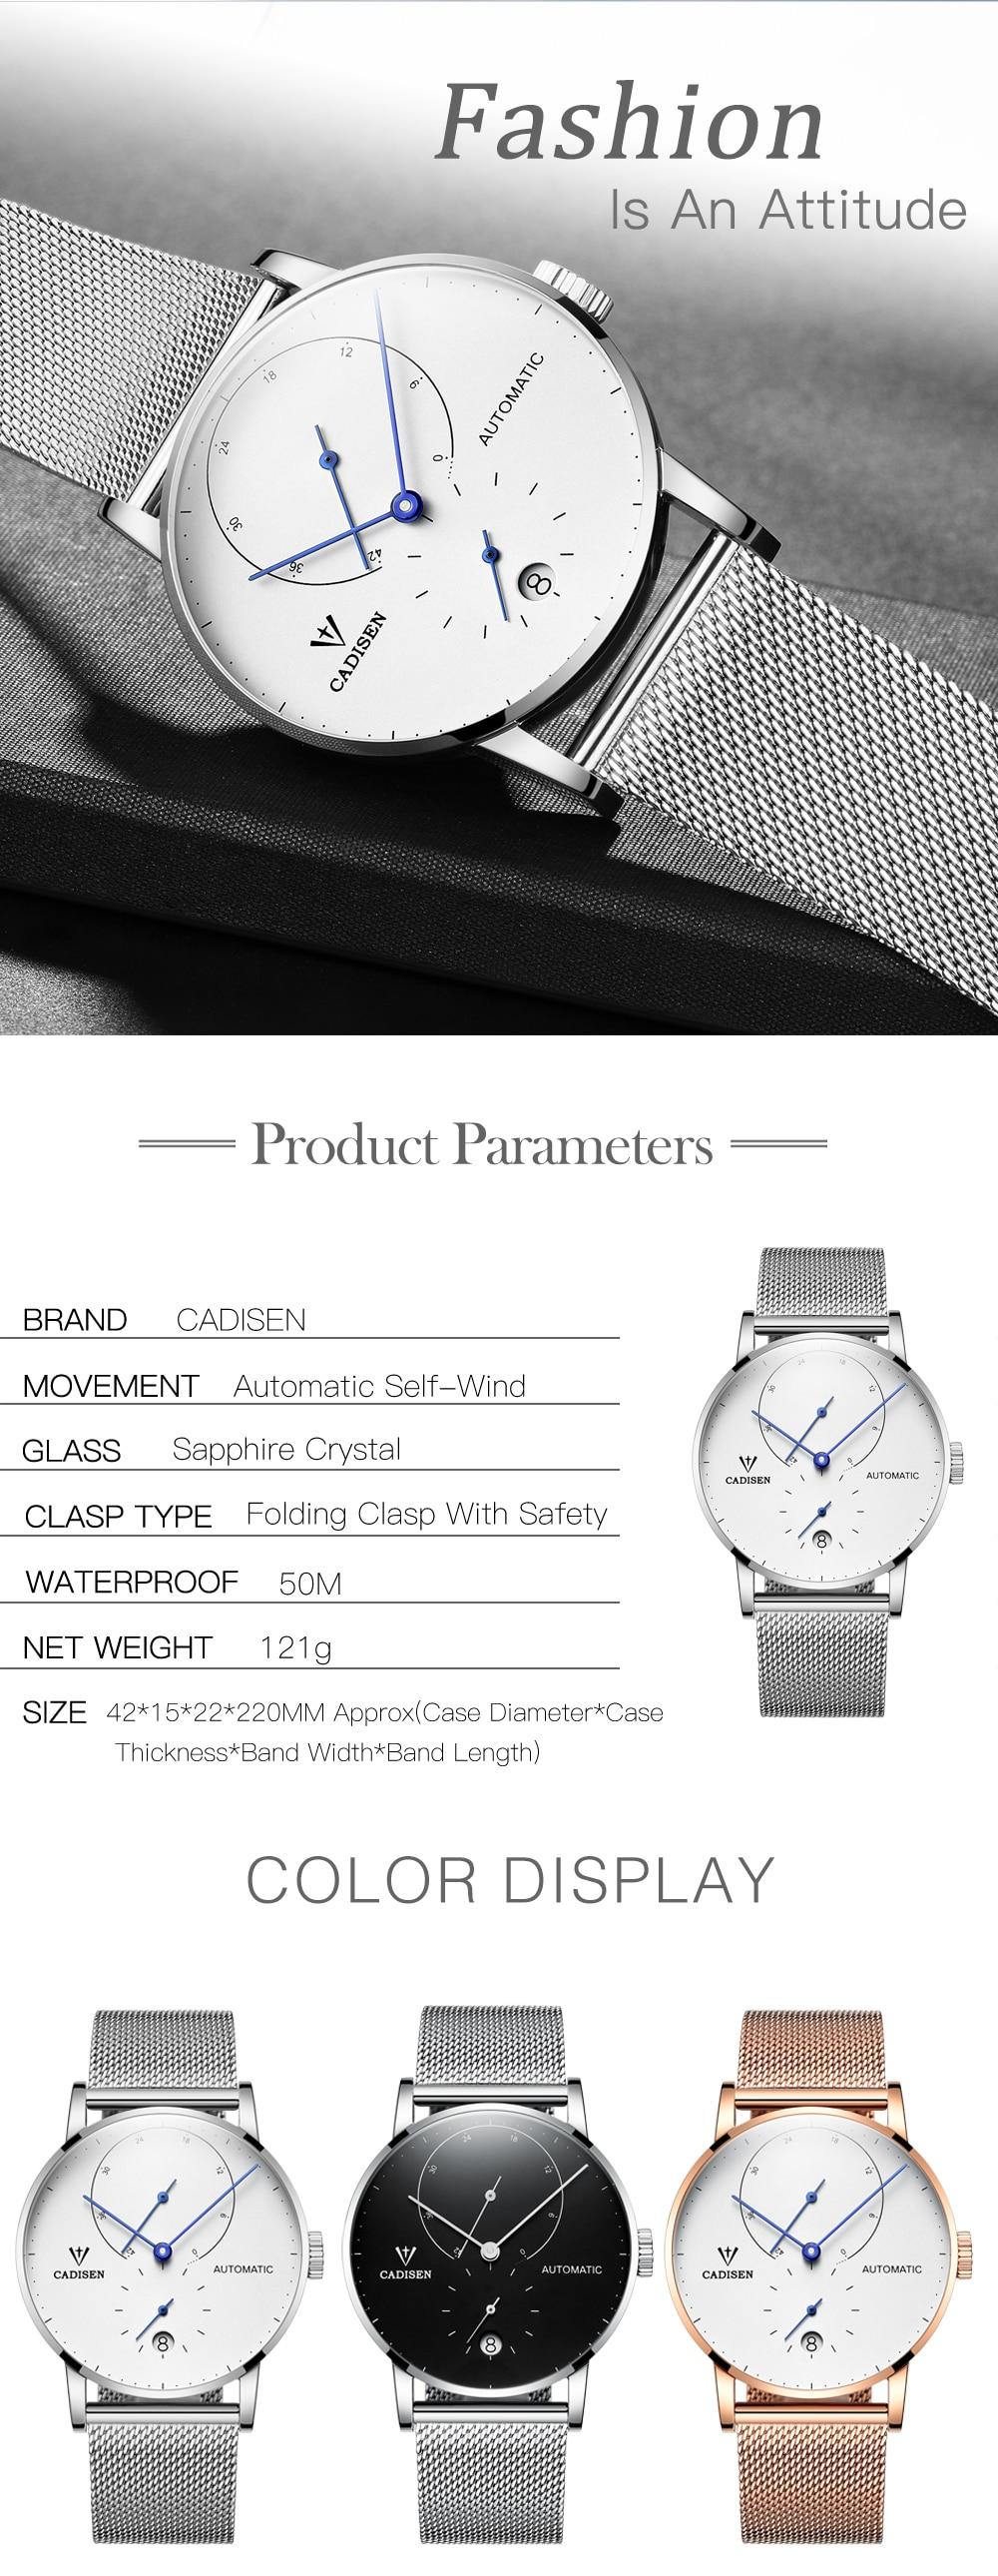 HTB10yfcu5OYBuNjSsD4q6zSkFXam Mens Watches CADISEN 2019 Top Luxury Brand Automatic Mechanical Watch Men Full Steel Business Waterproof Fashion Sport Watches